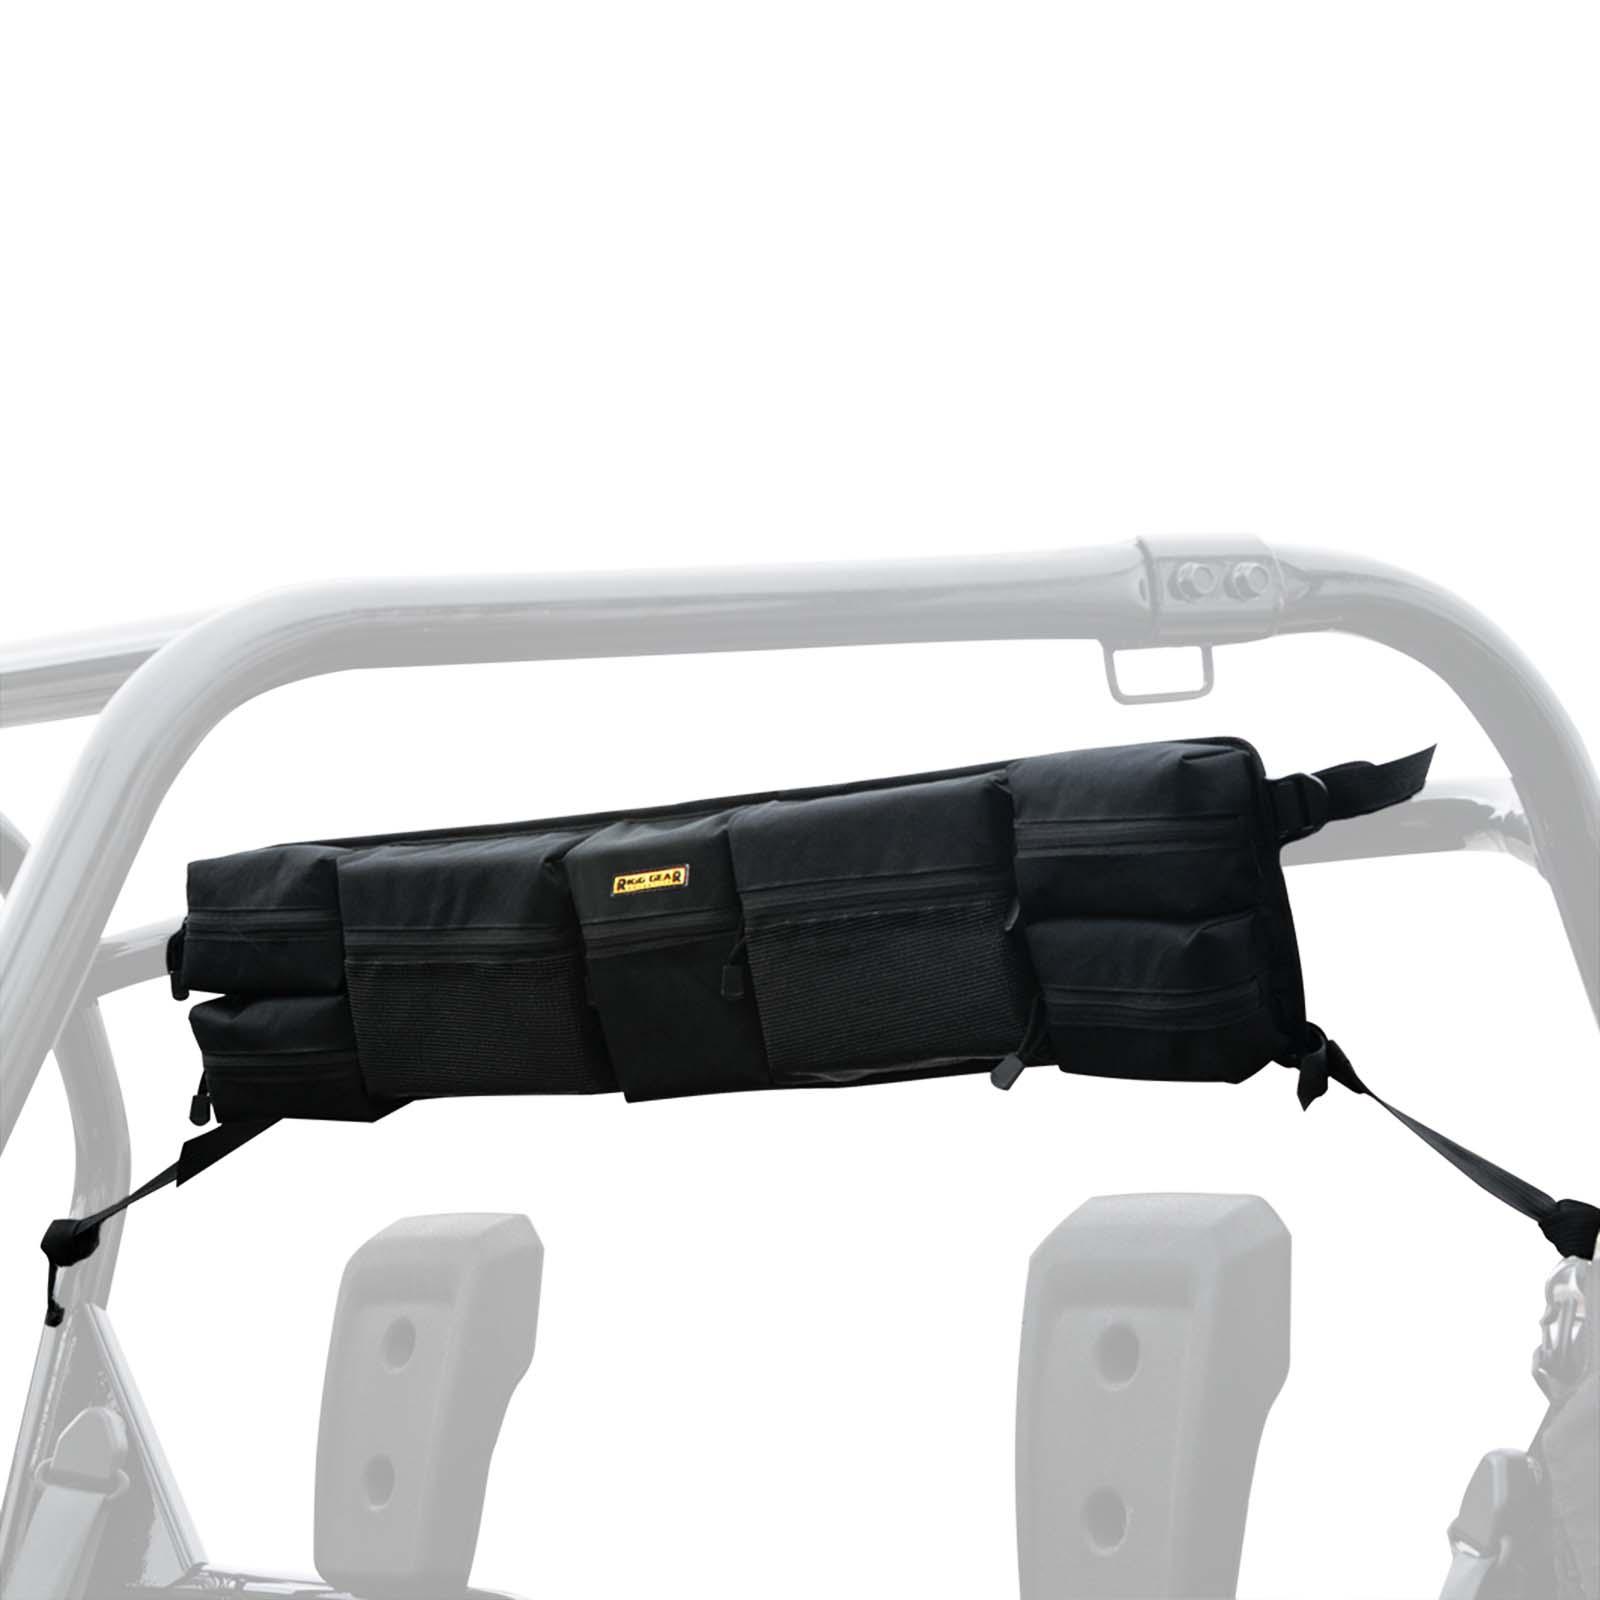 Nelson-Rigg UTV-100 Black UTV Roll Cage Cargo Bag